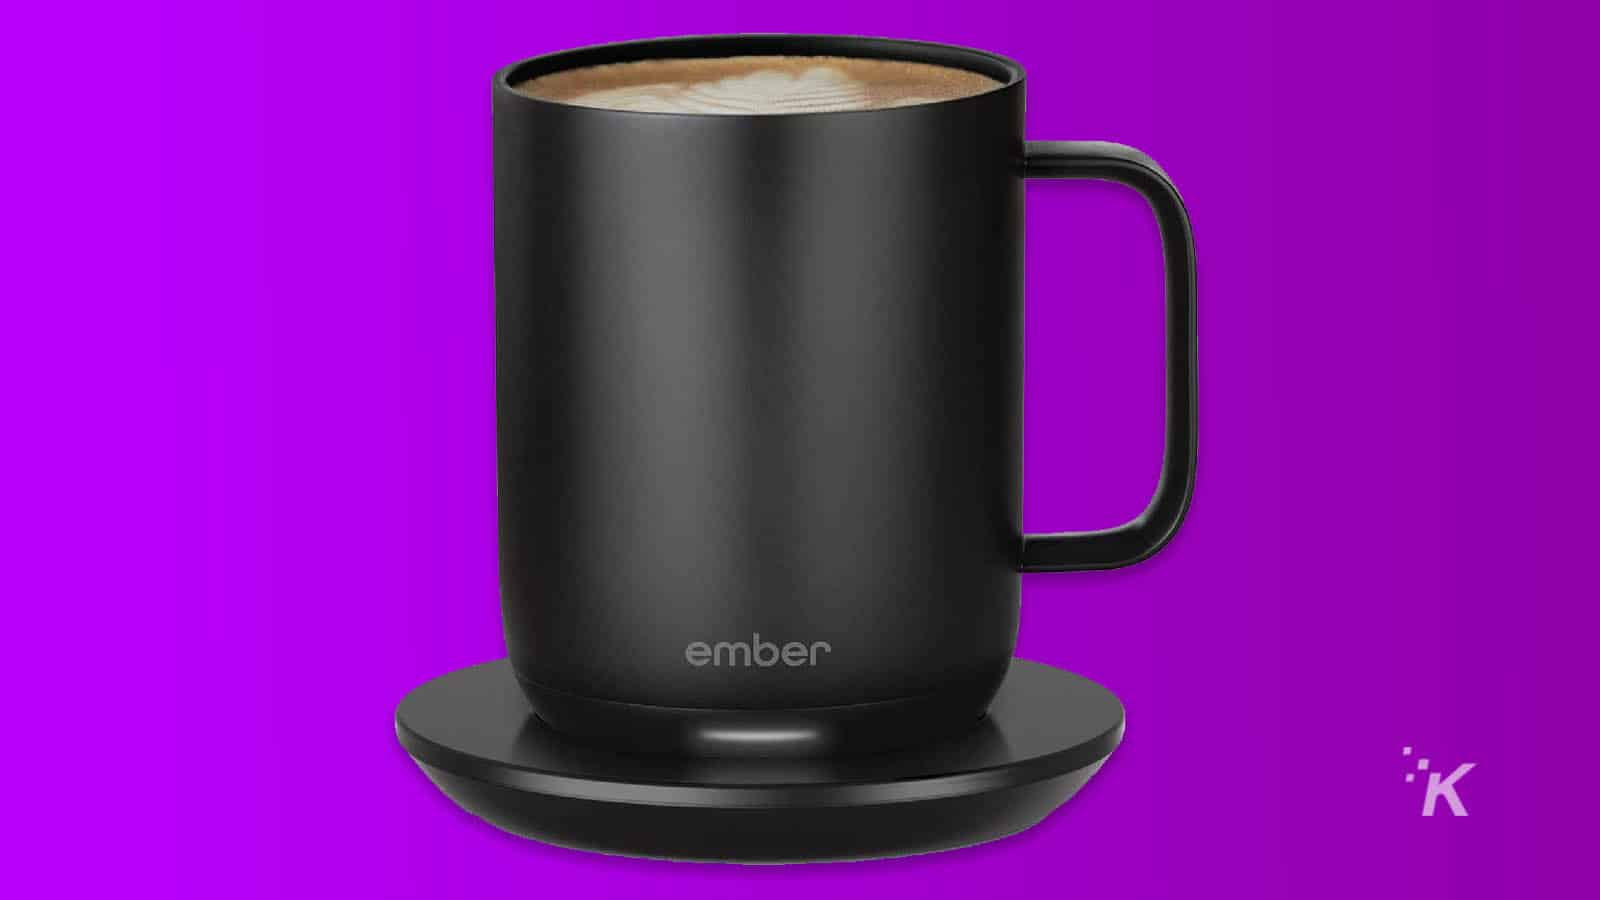 ember coffee mug for valentine's day